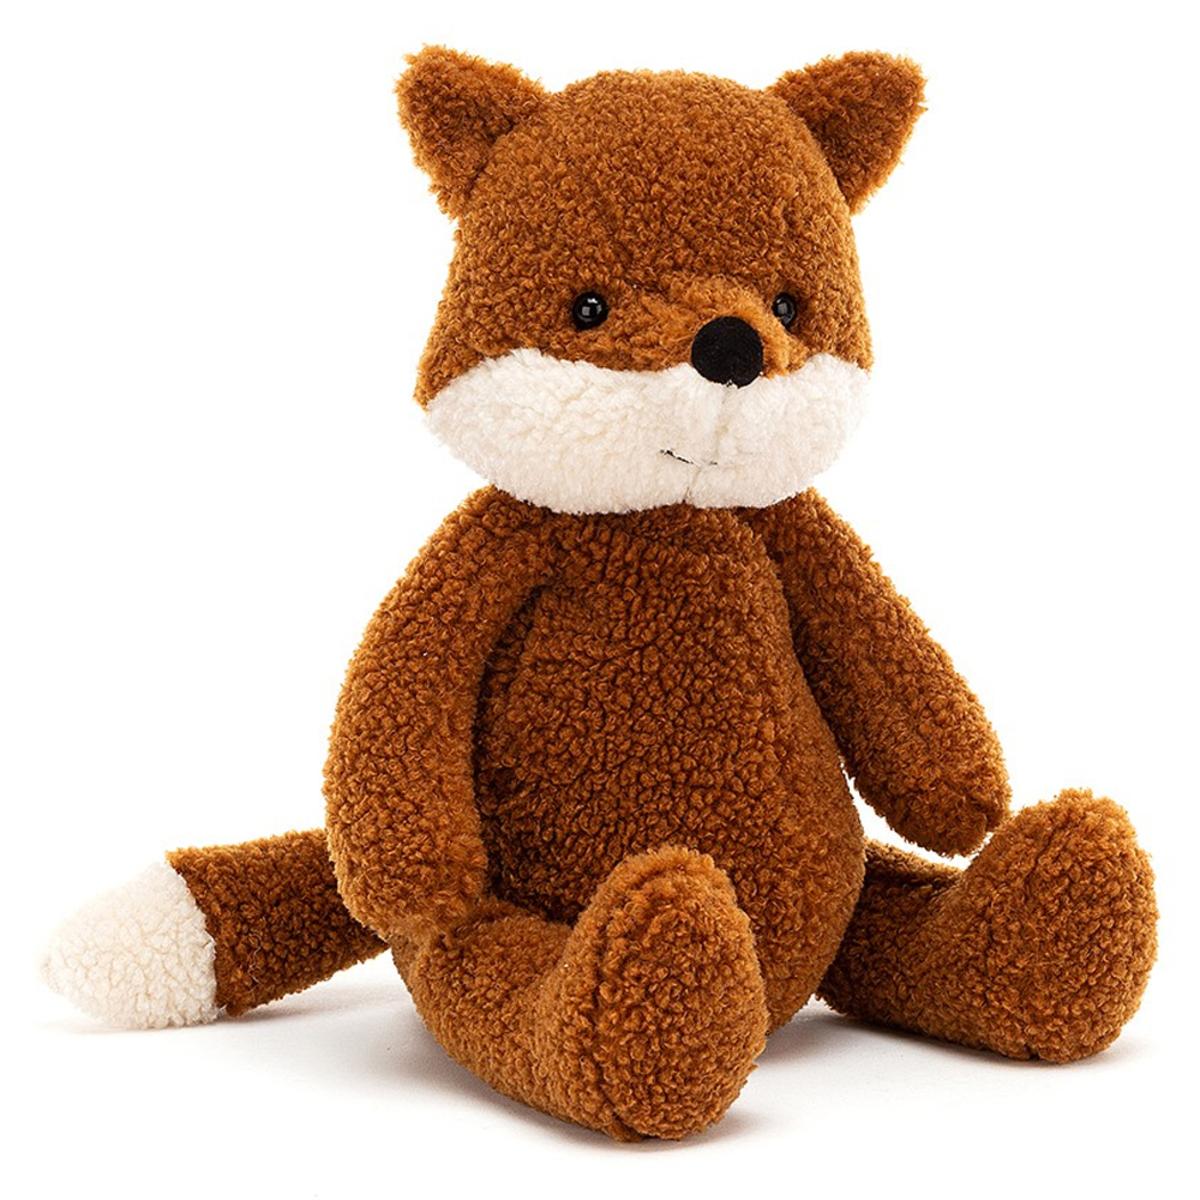 Peluche Allenby Fox - Medium Peluche Renard 35 cm